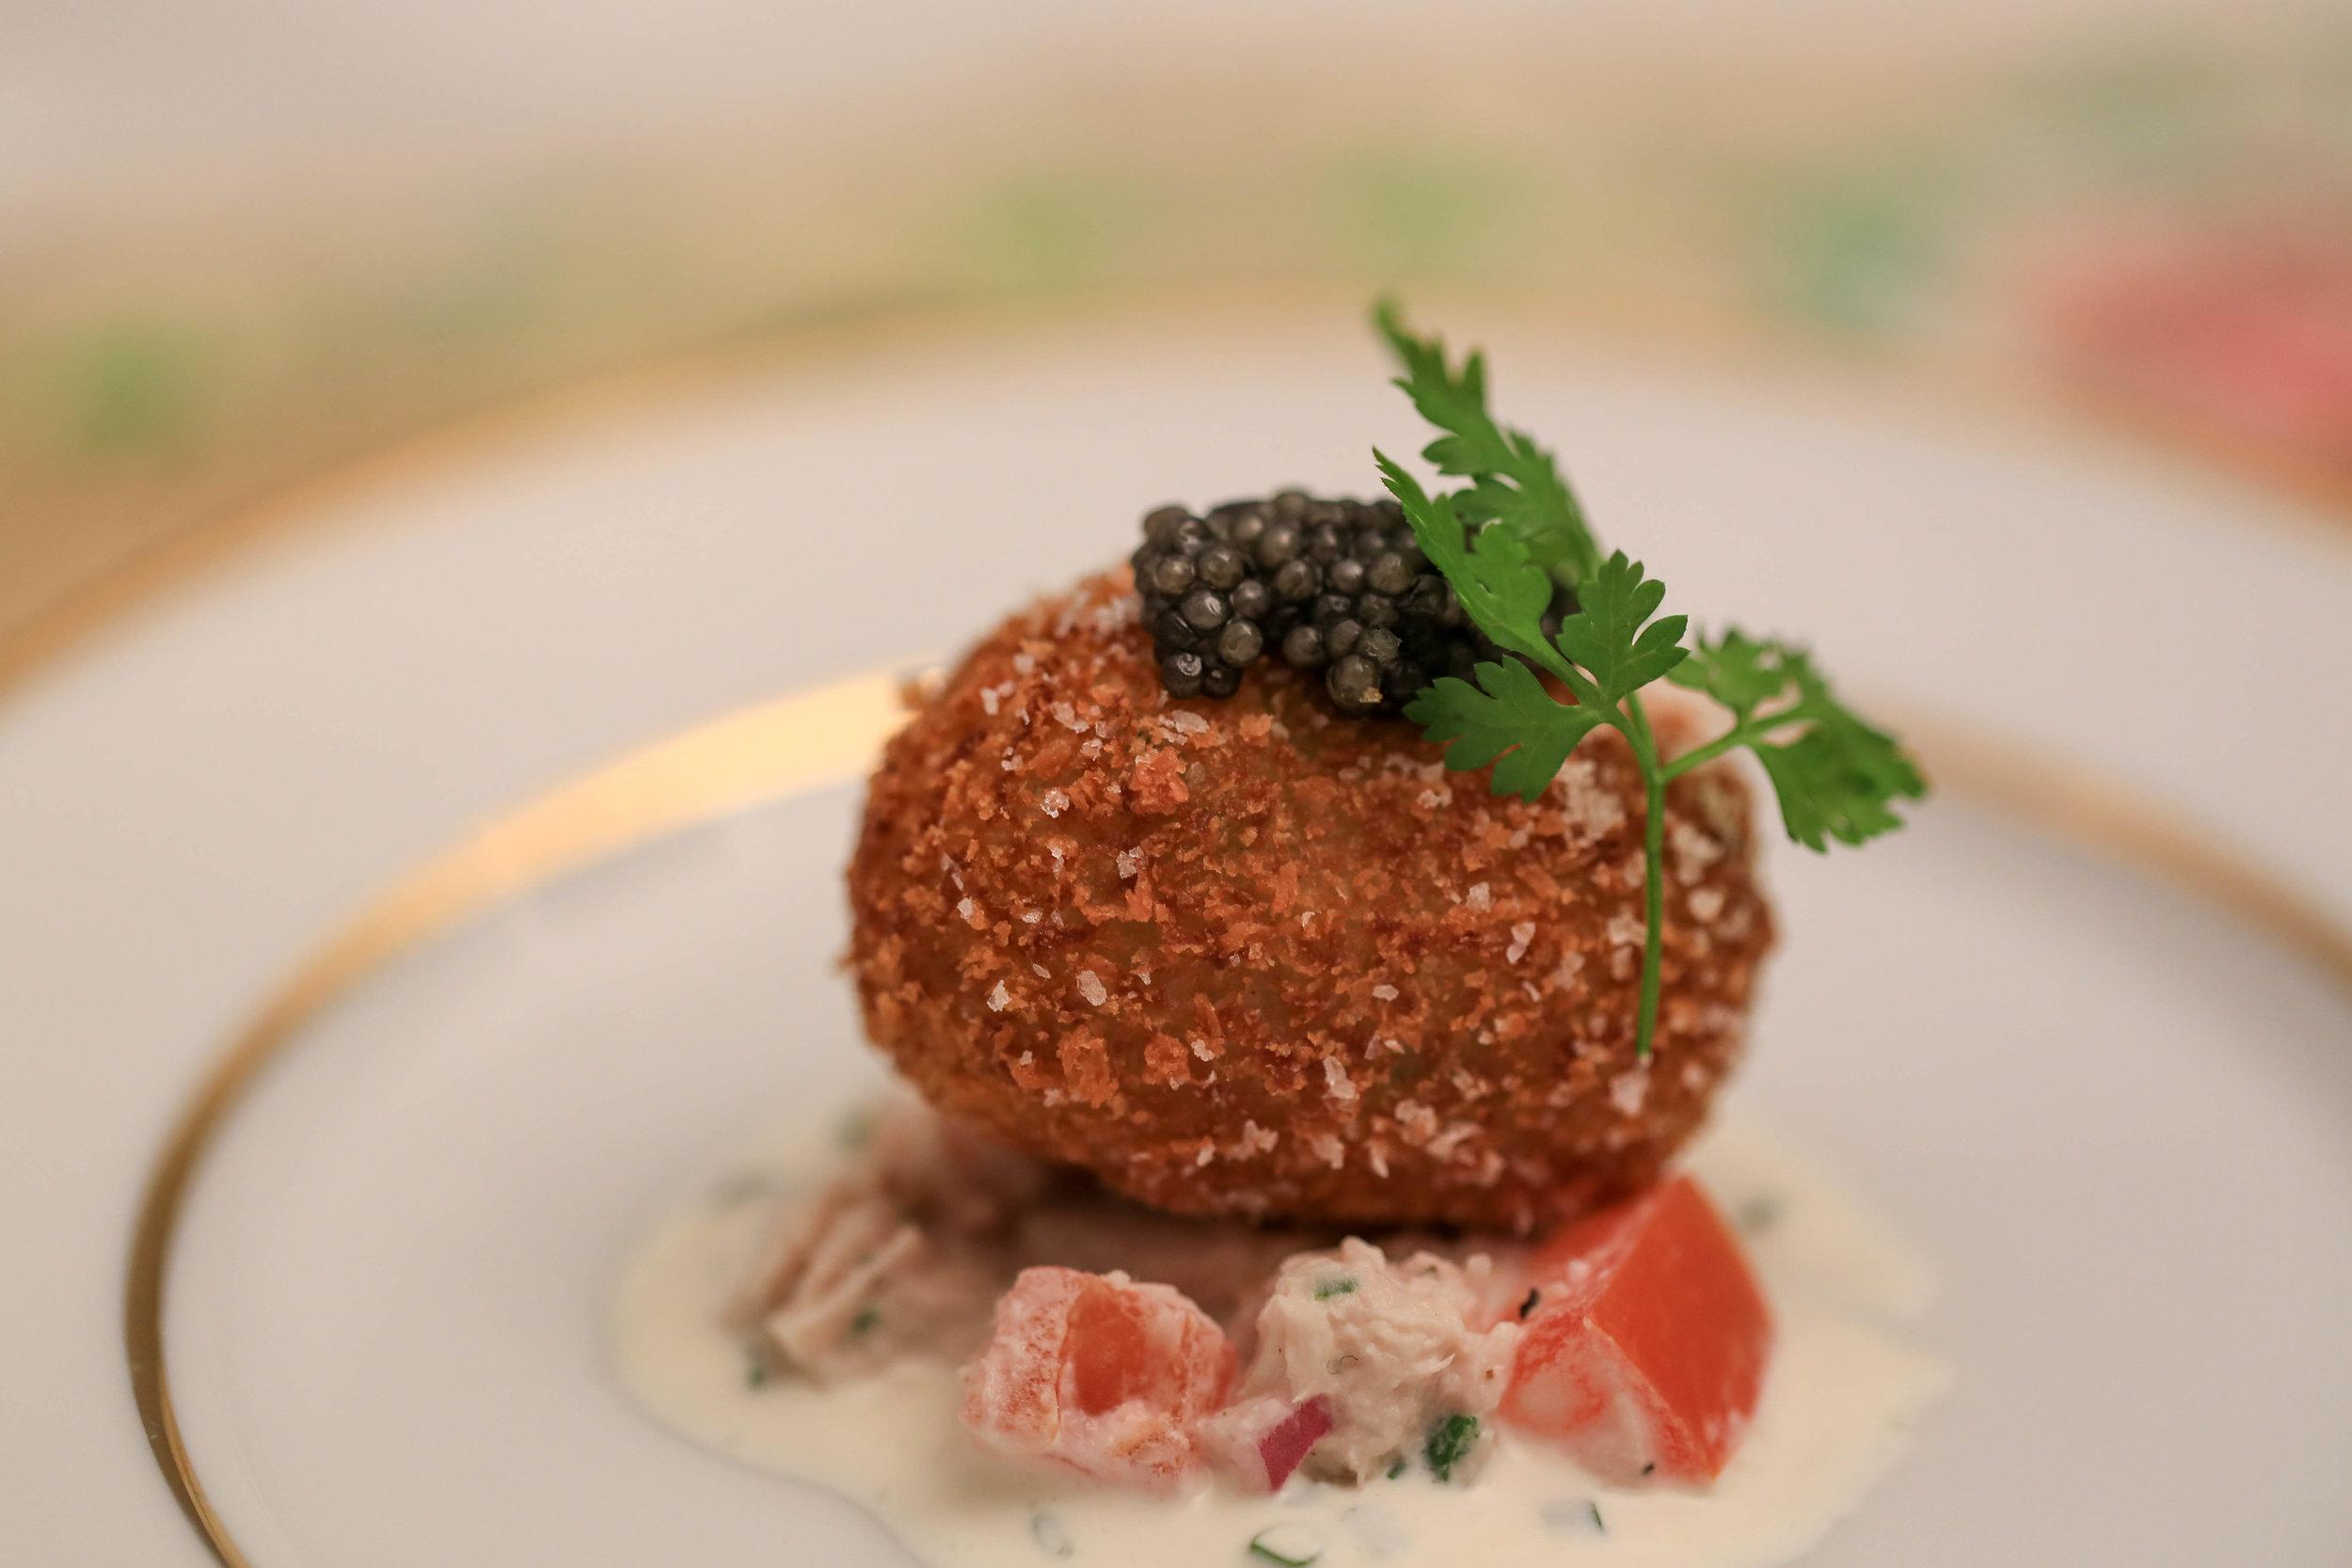 Cold smoked sturgeon, chive tater tot, caviar, chervil